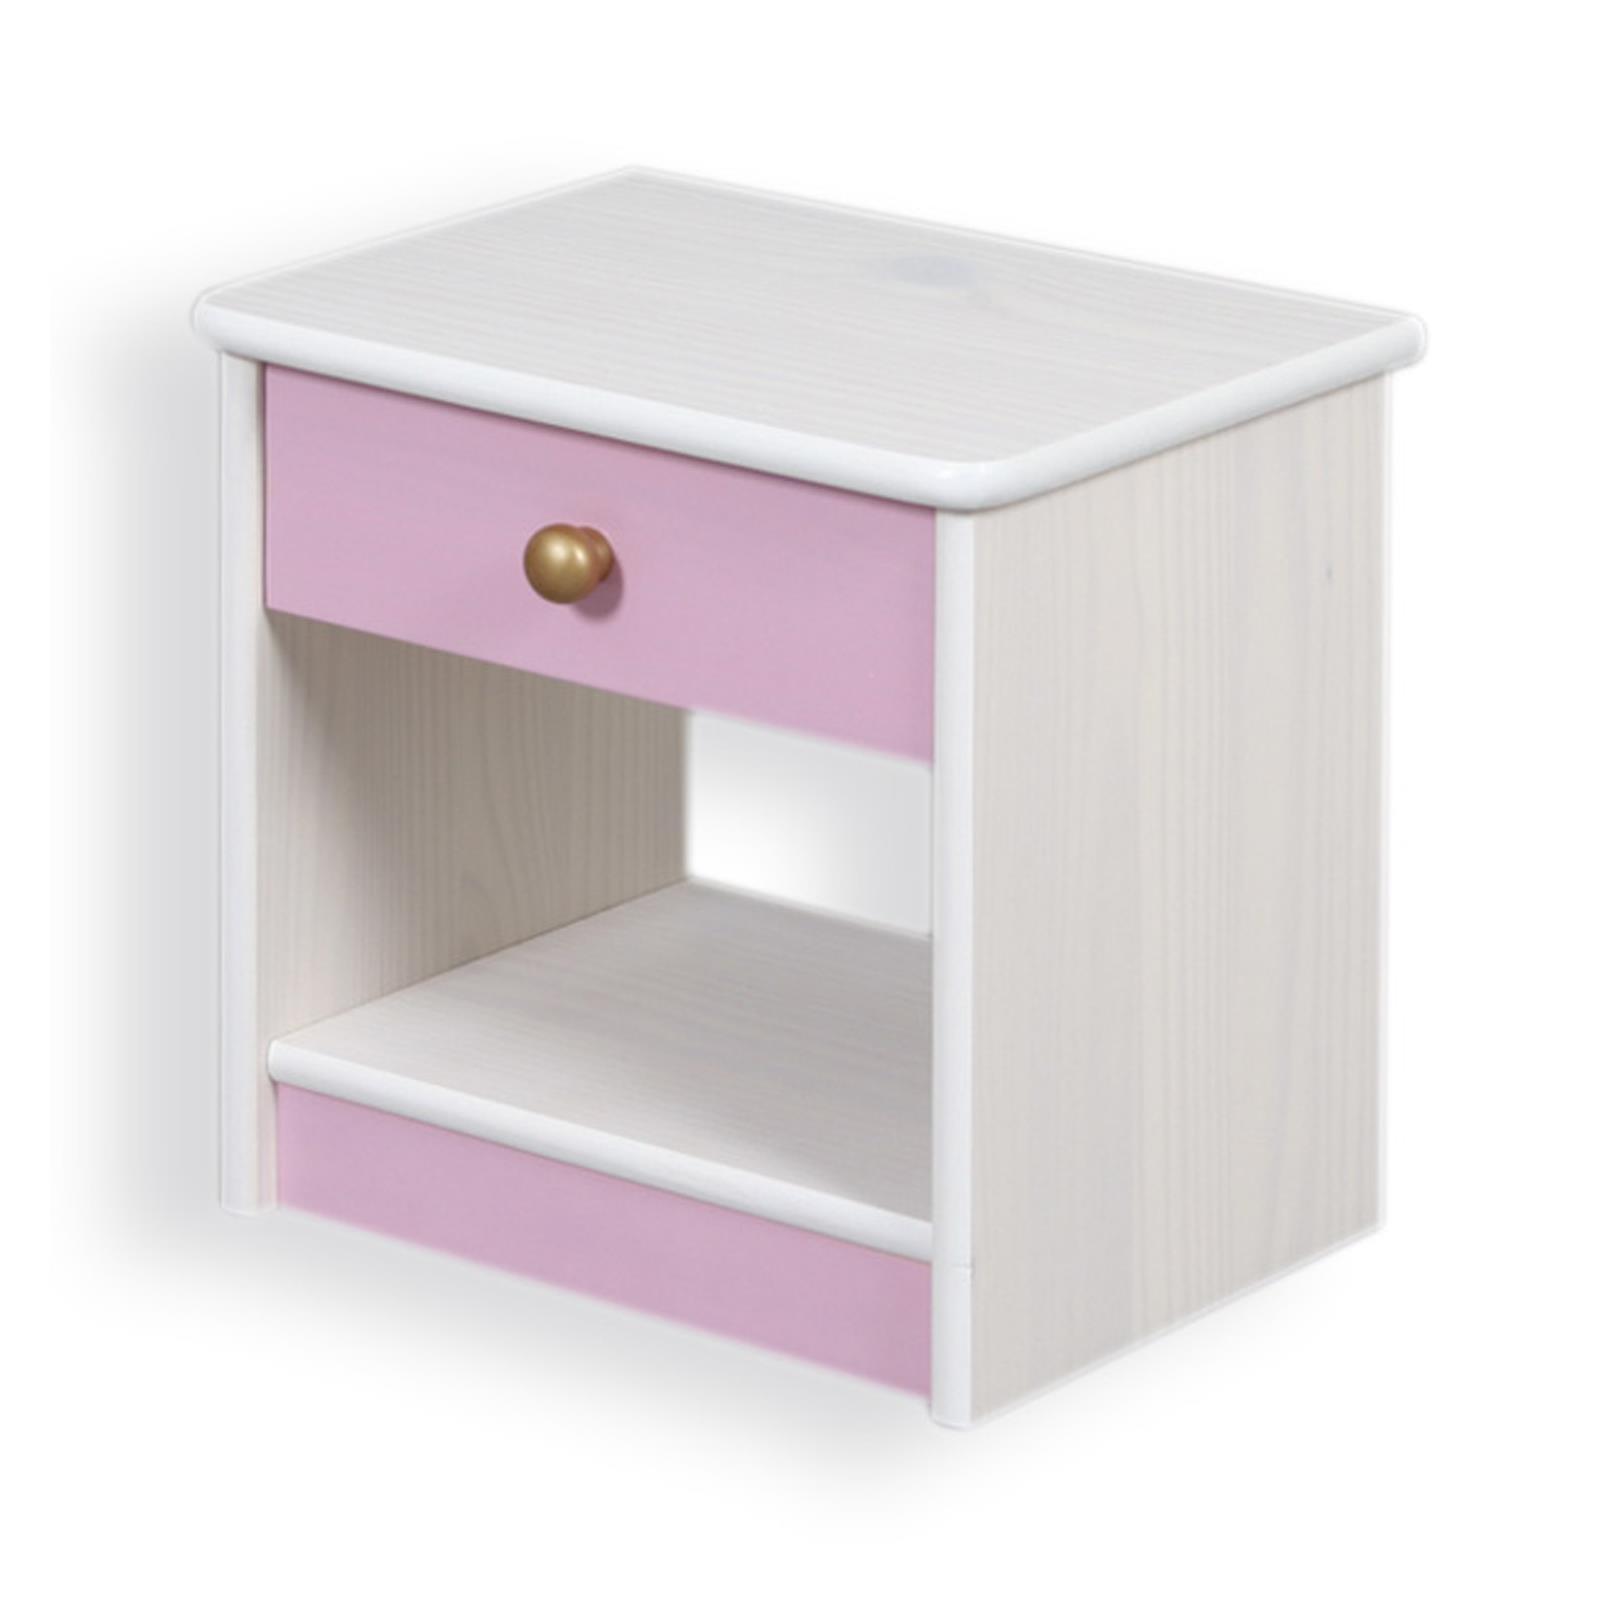 Table de chevet en pin isabella mobil meubles - Table de chevet en pin ...